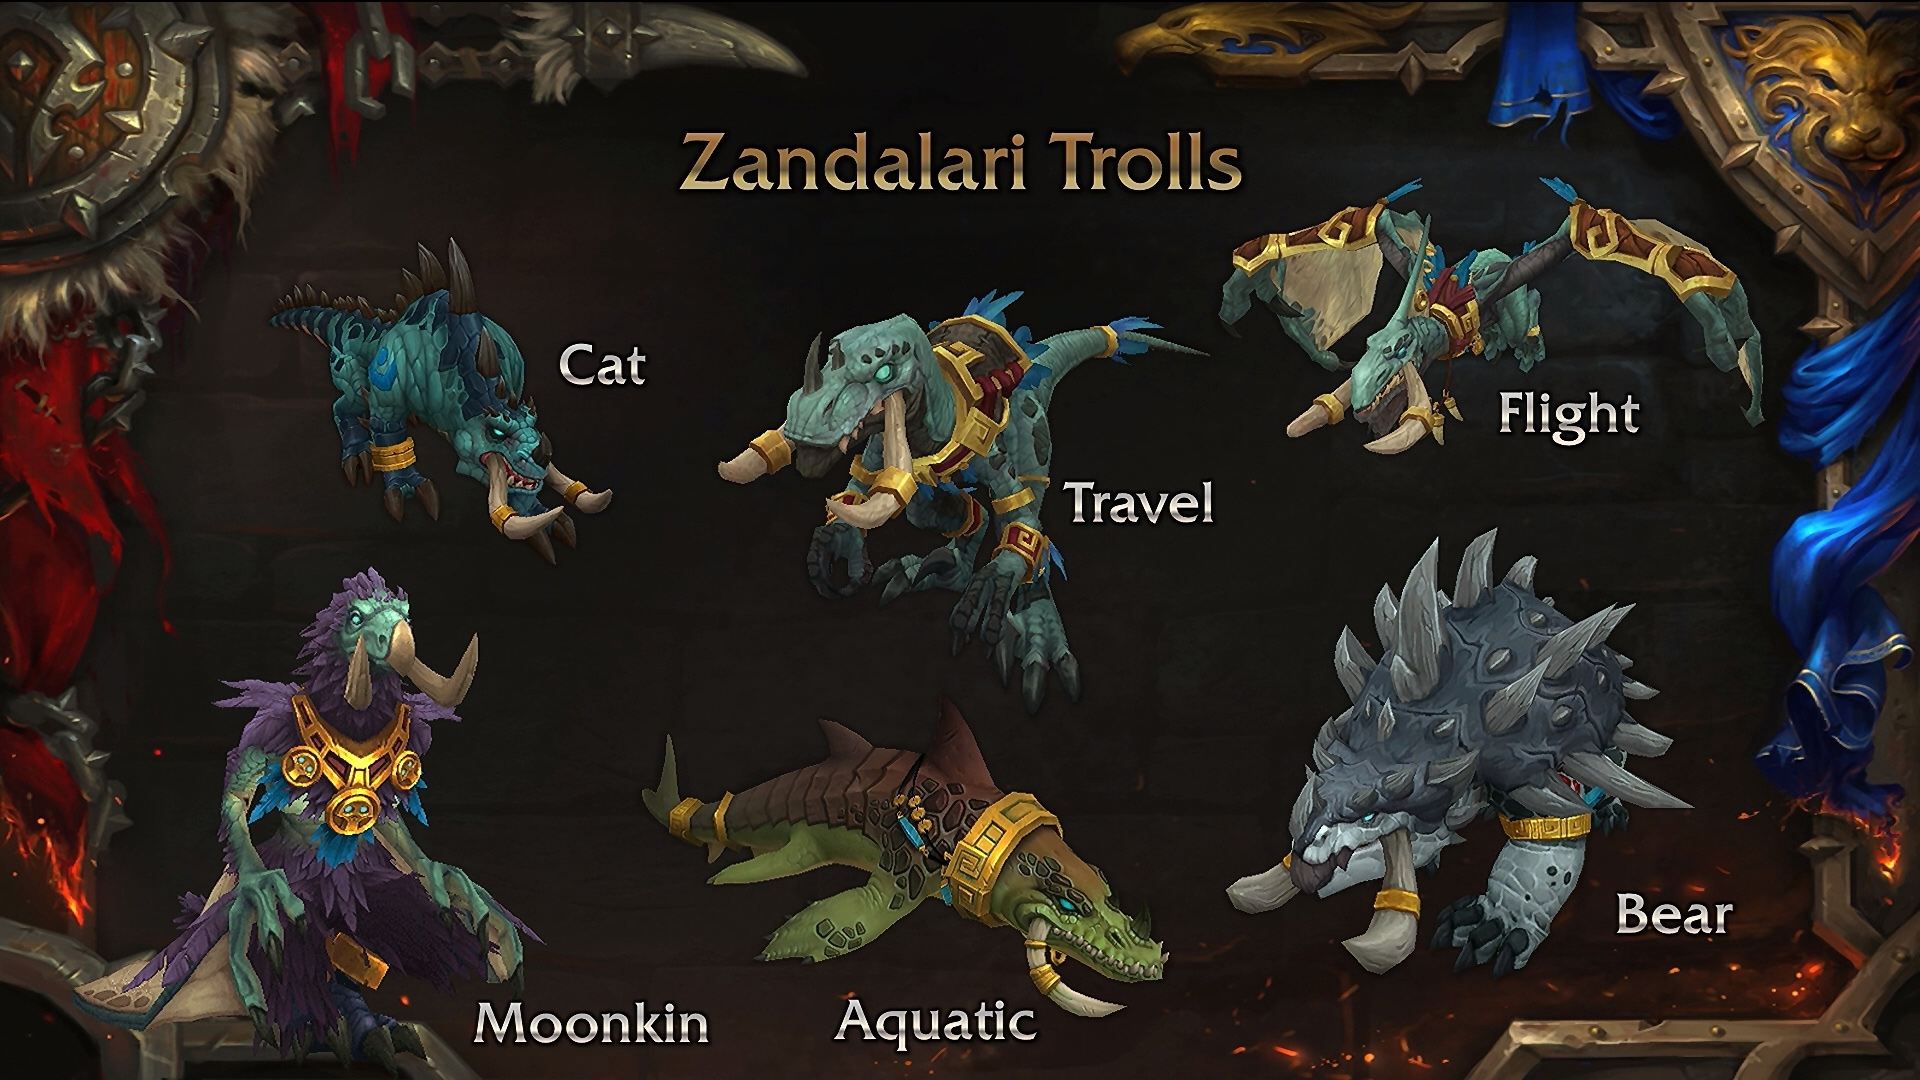 Troll Zandalari : Formes Druide